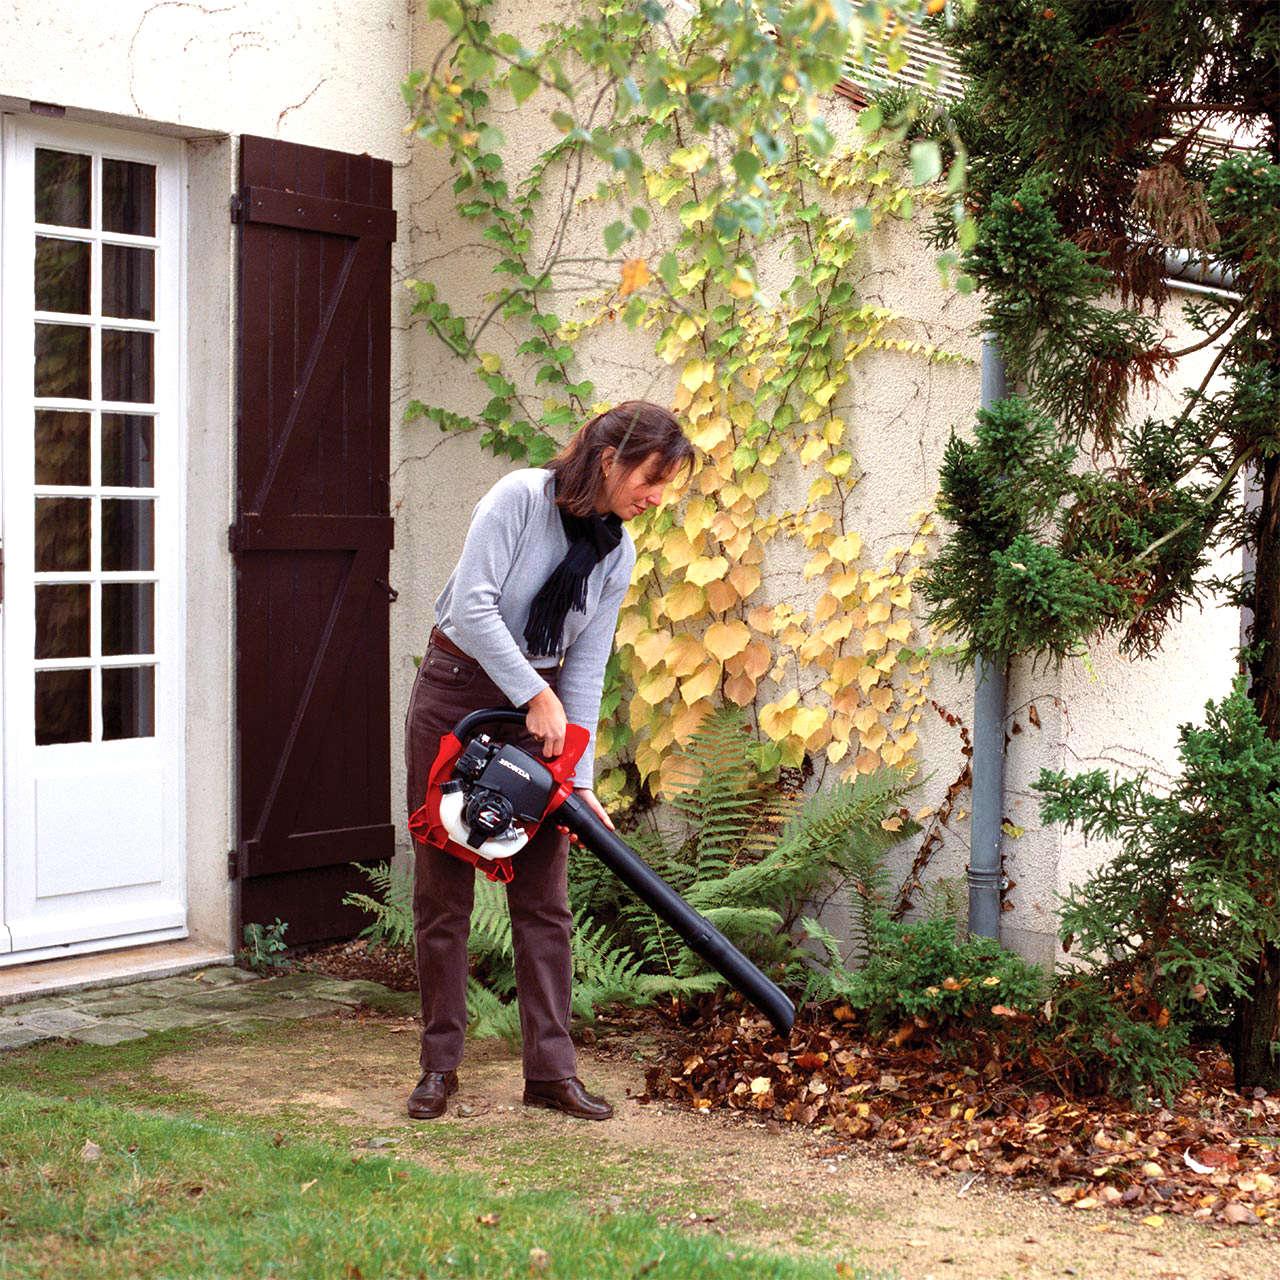 Petrol leaf blowers cordless garden tools honda uk leaf blower fast and furious publicscrutiny Choice Image